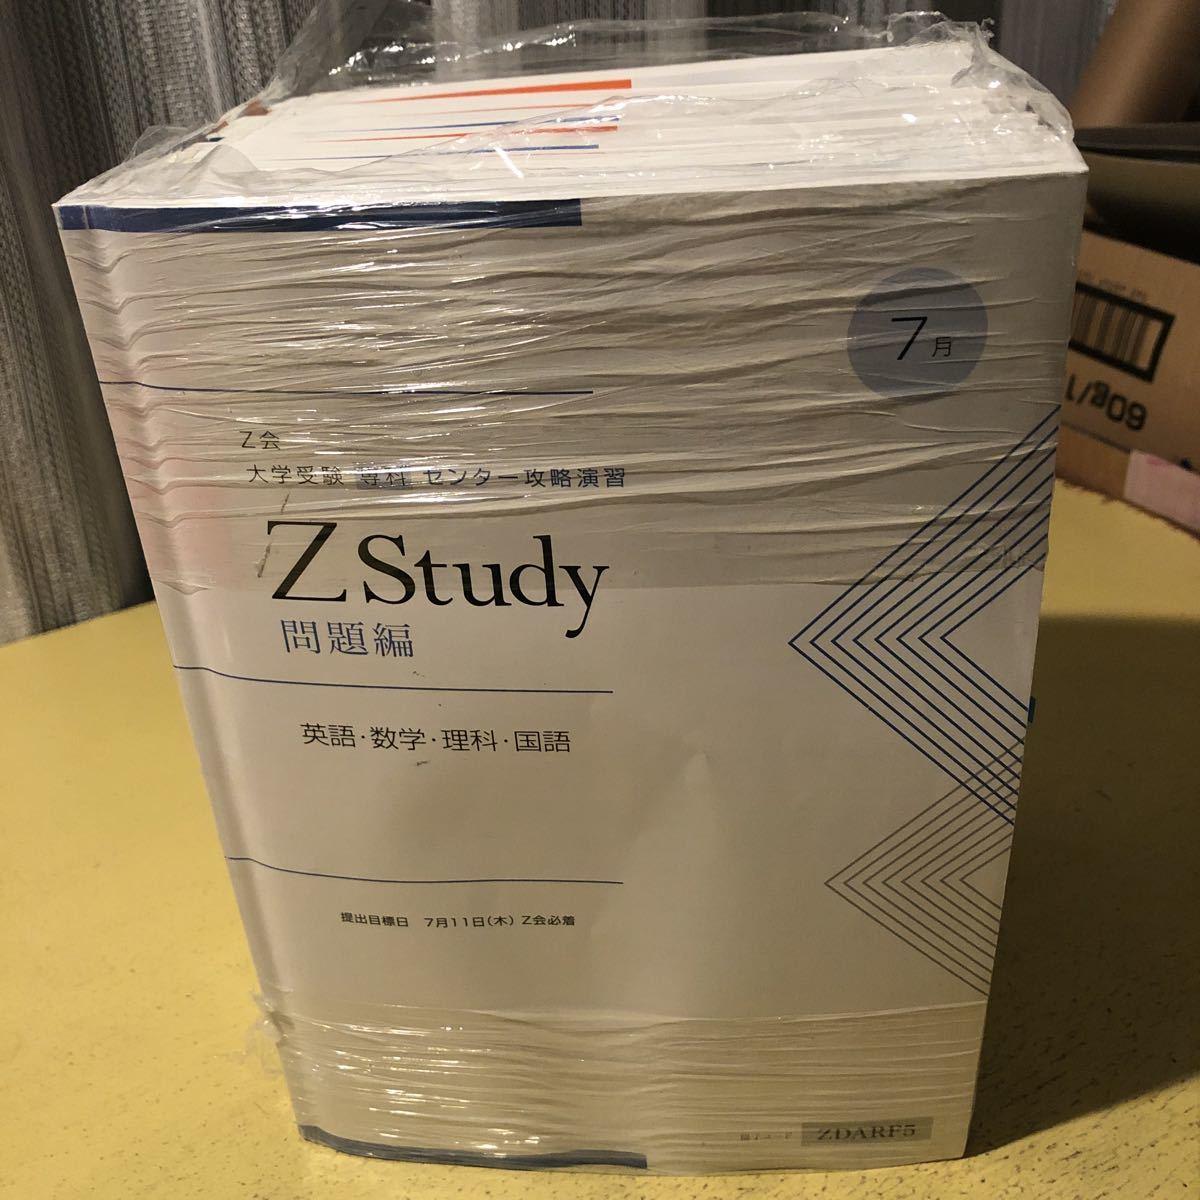 2004☆た00中☆ Z会 大学受験専科センター攻略演習 Z.Study 21冊セット 英語/数学/理科/国語 2019年 問題編/解答解説編